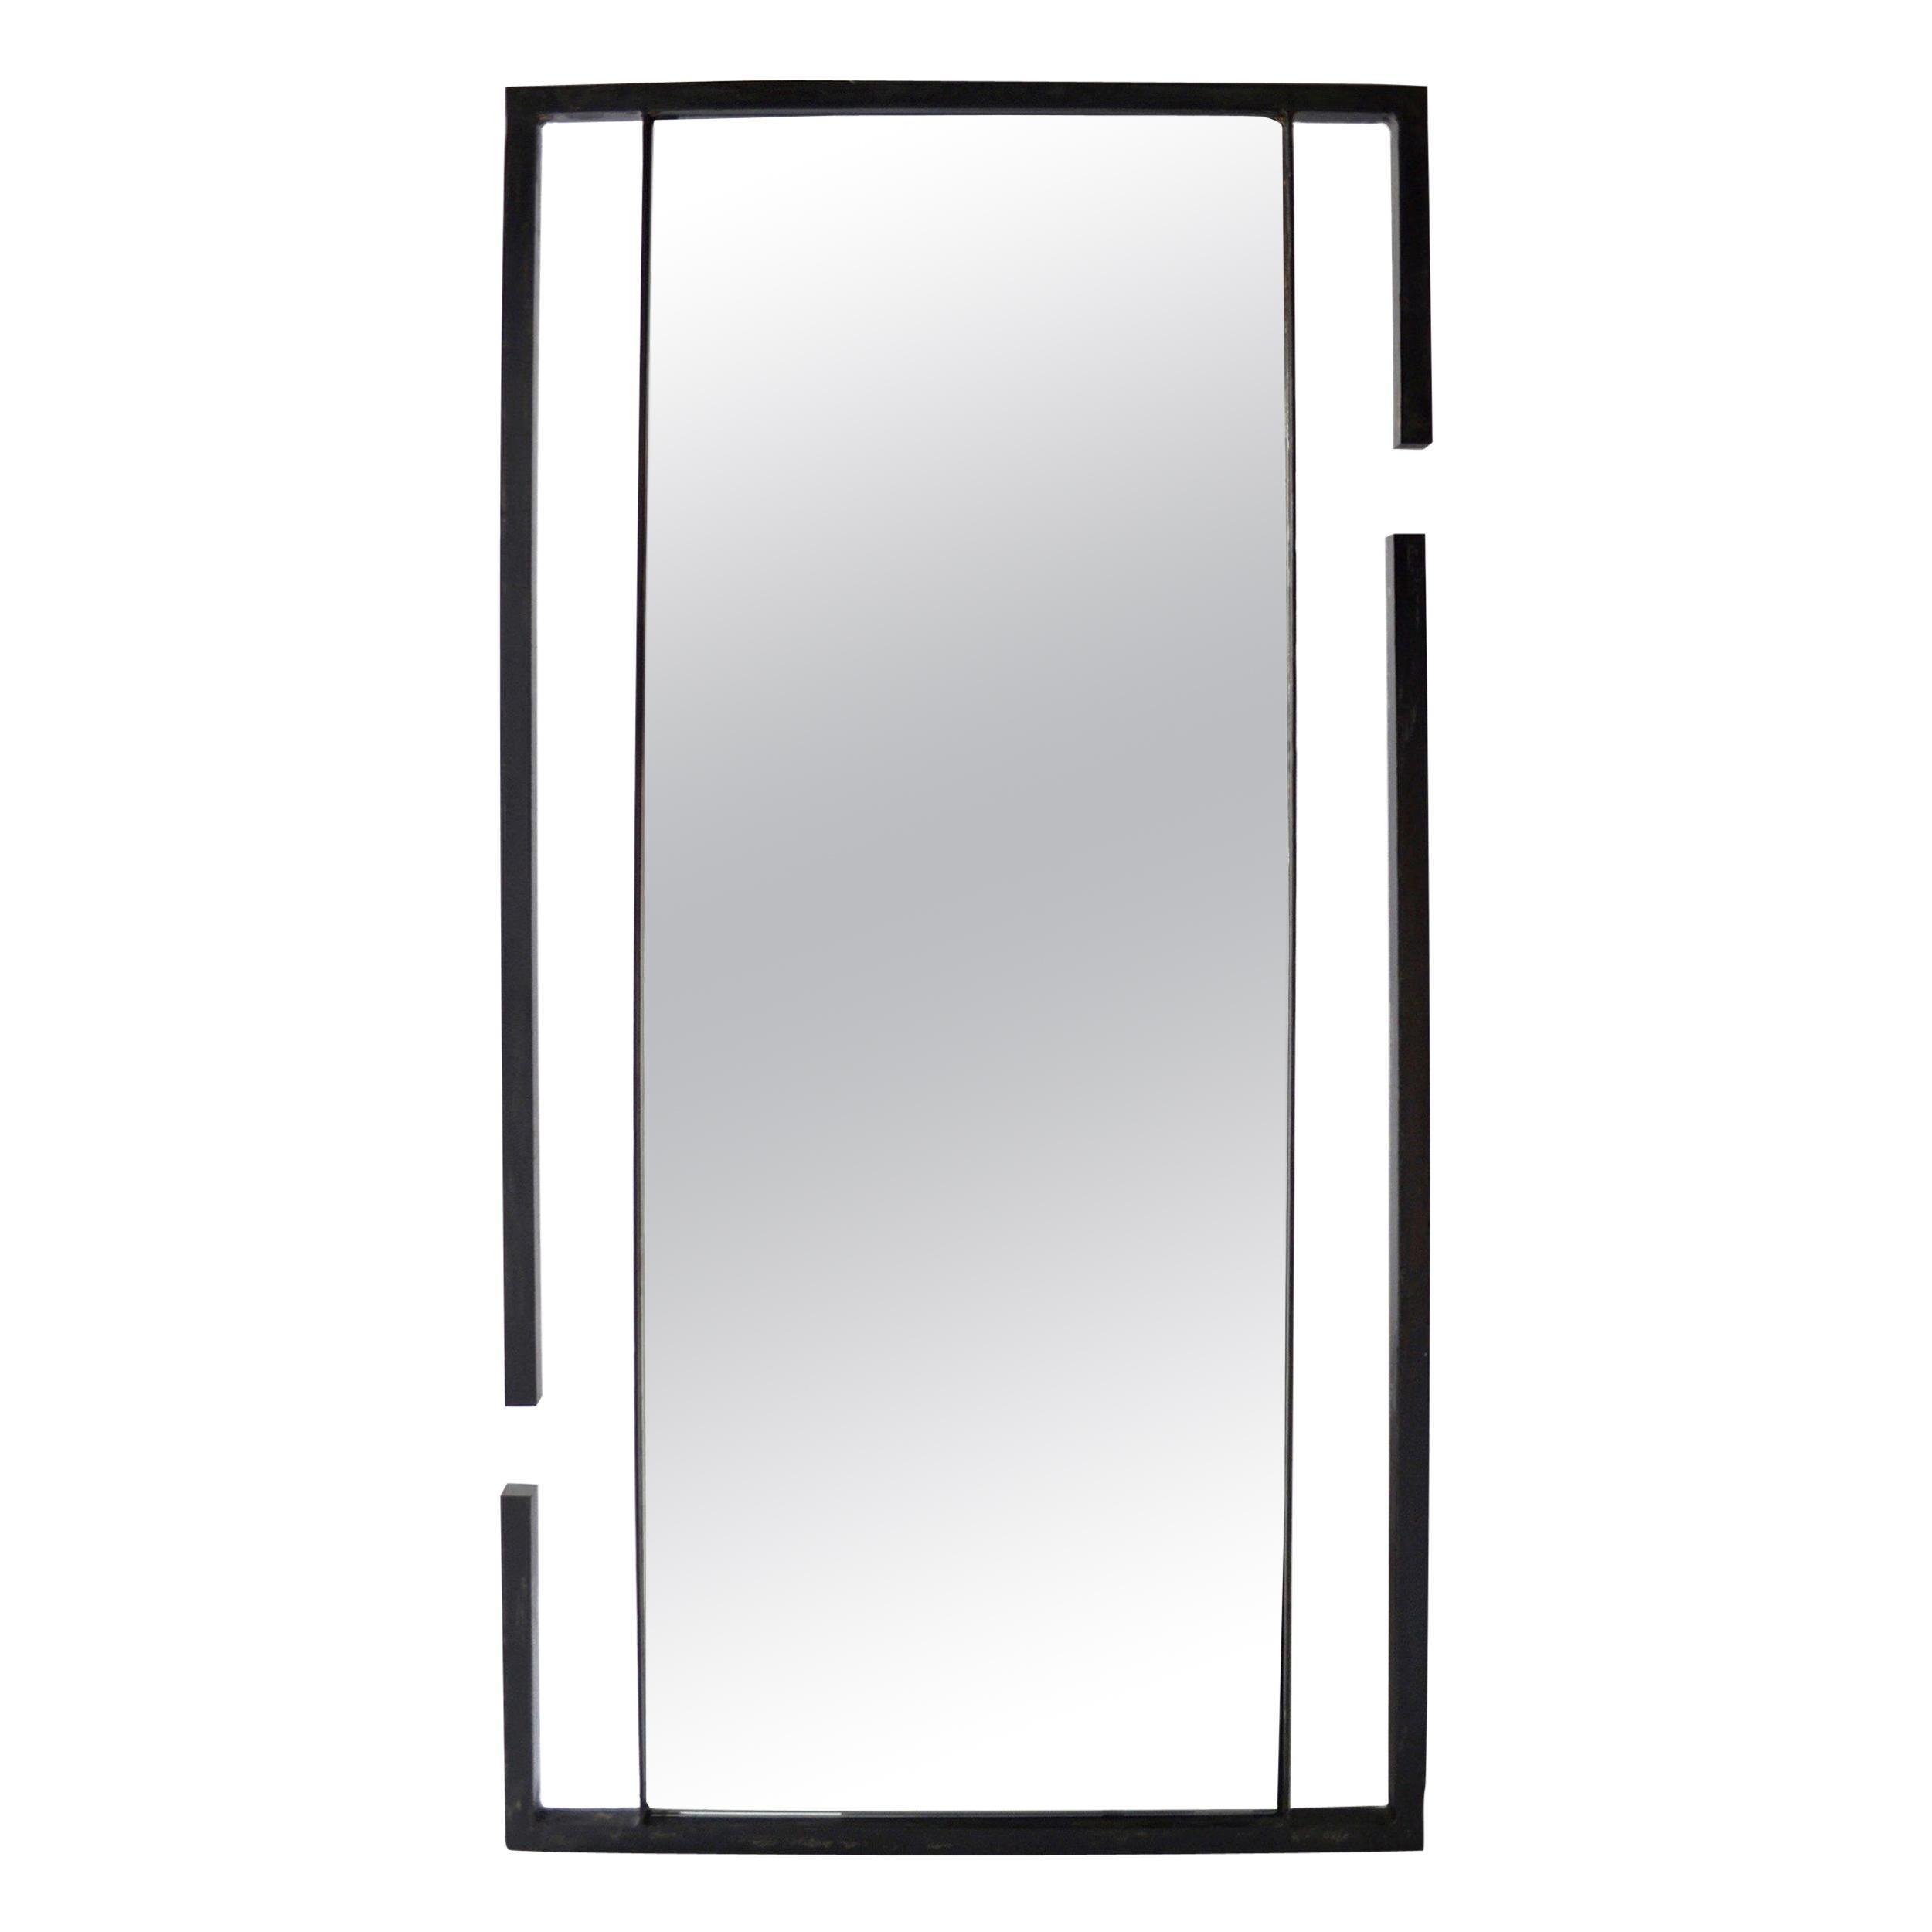 Wall or Floor Mirror Modern Minimalist Breaks Dramatic Geometric Blackened Steel